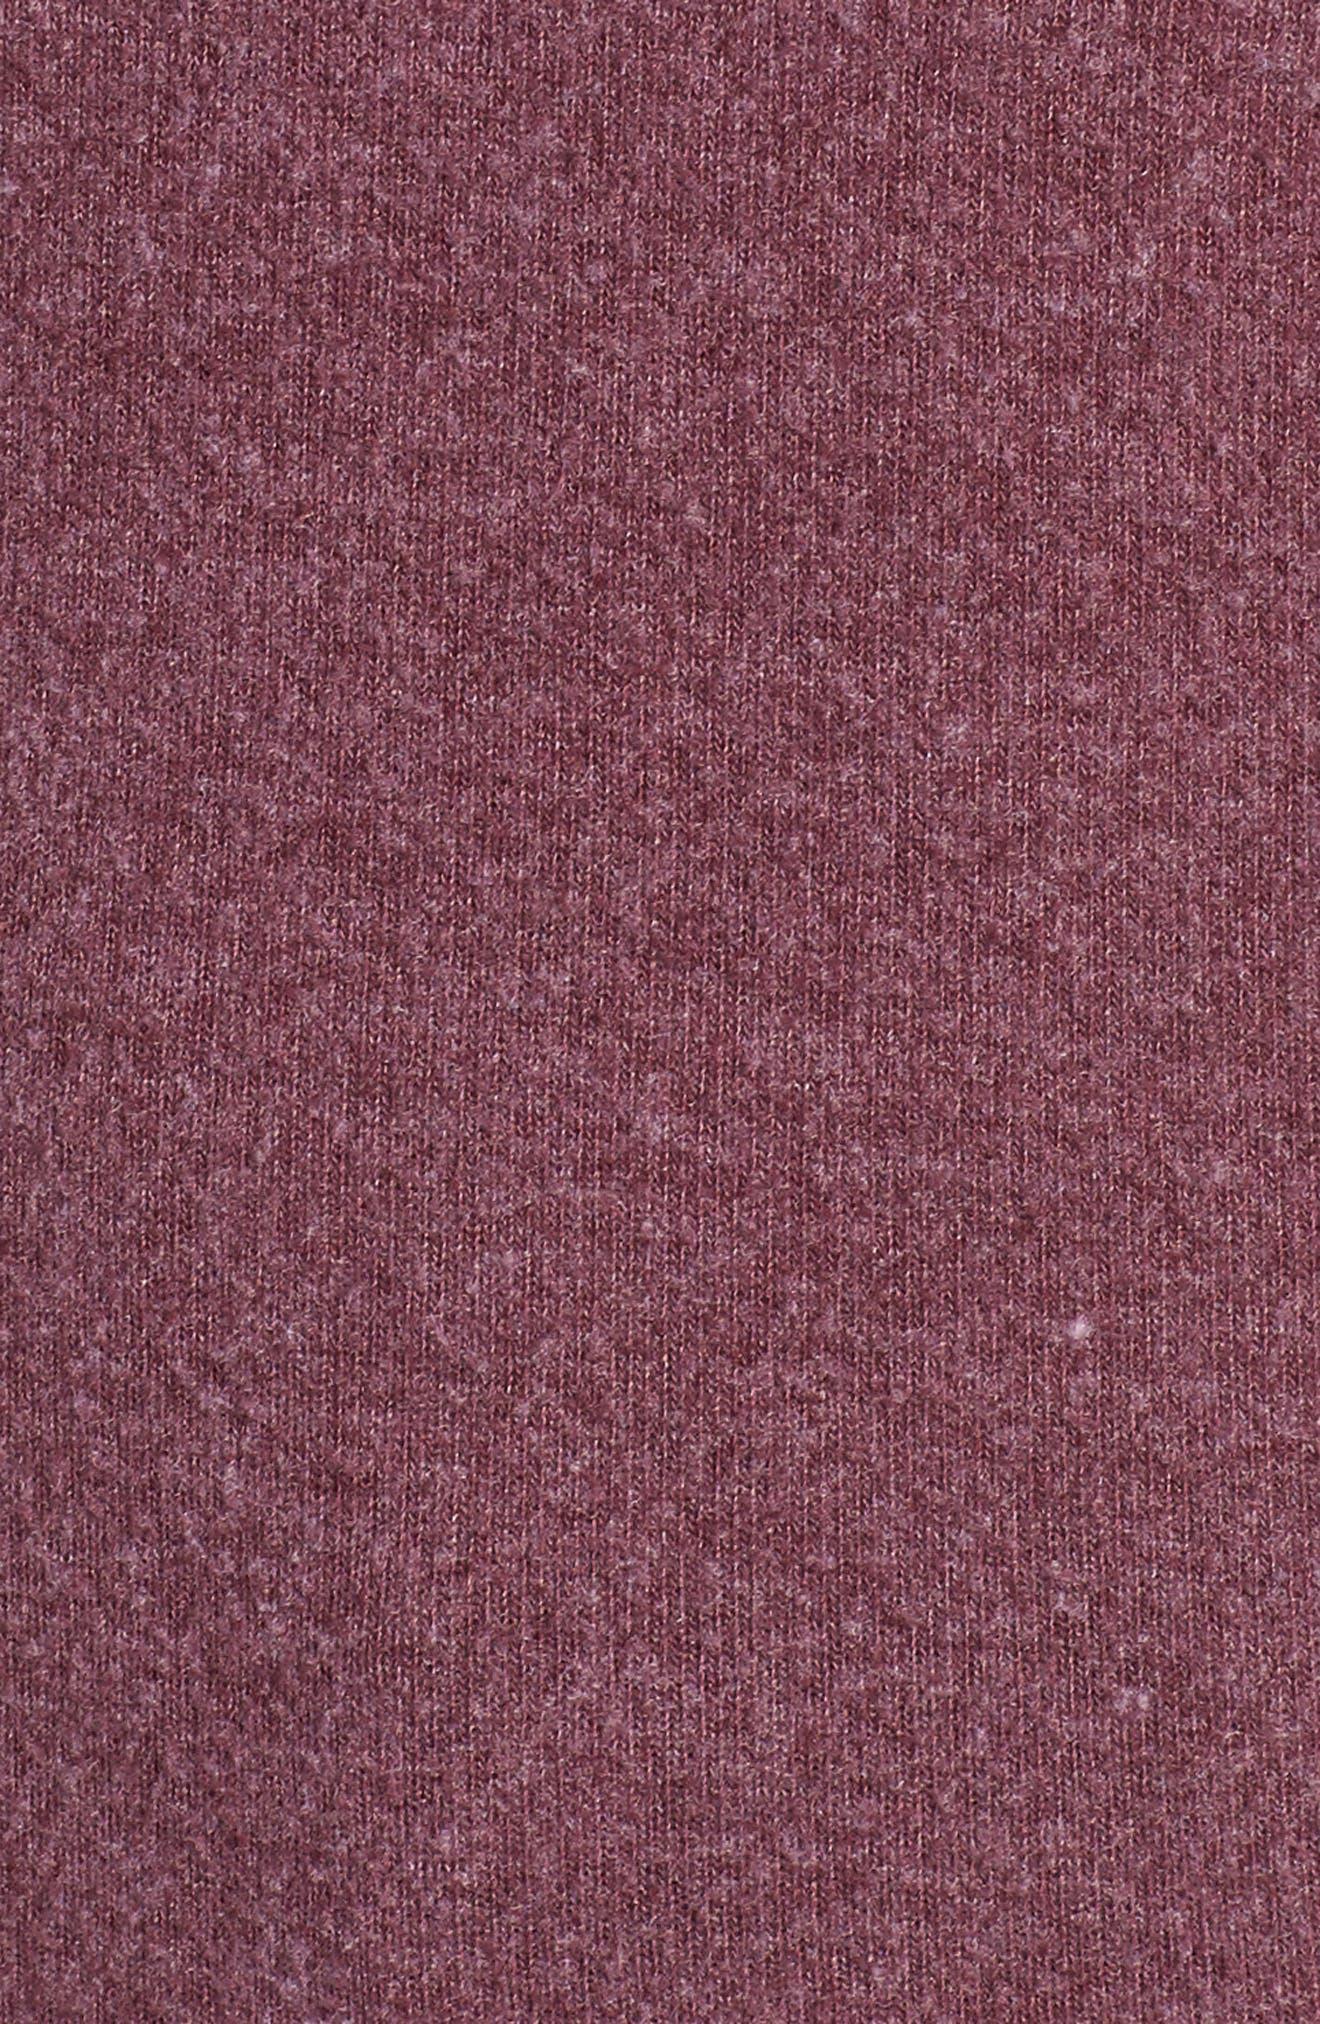 I Believe in Santa Sweatshirt,                             Alternate thumbnail 5, color,                             930